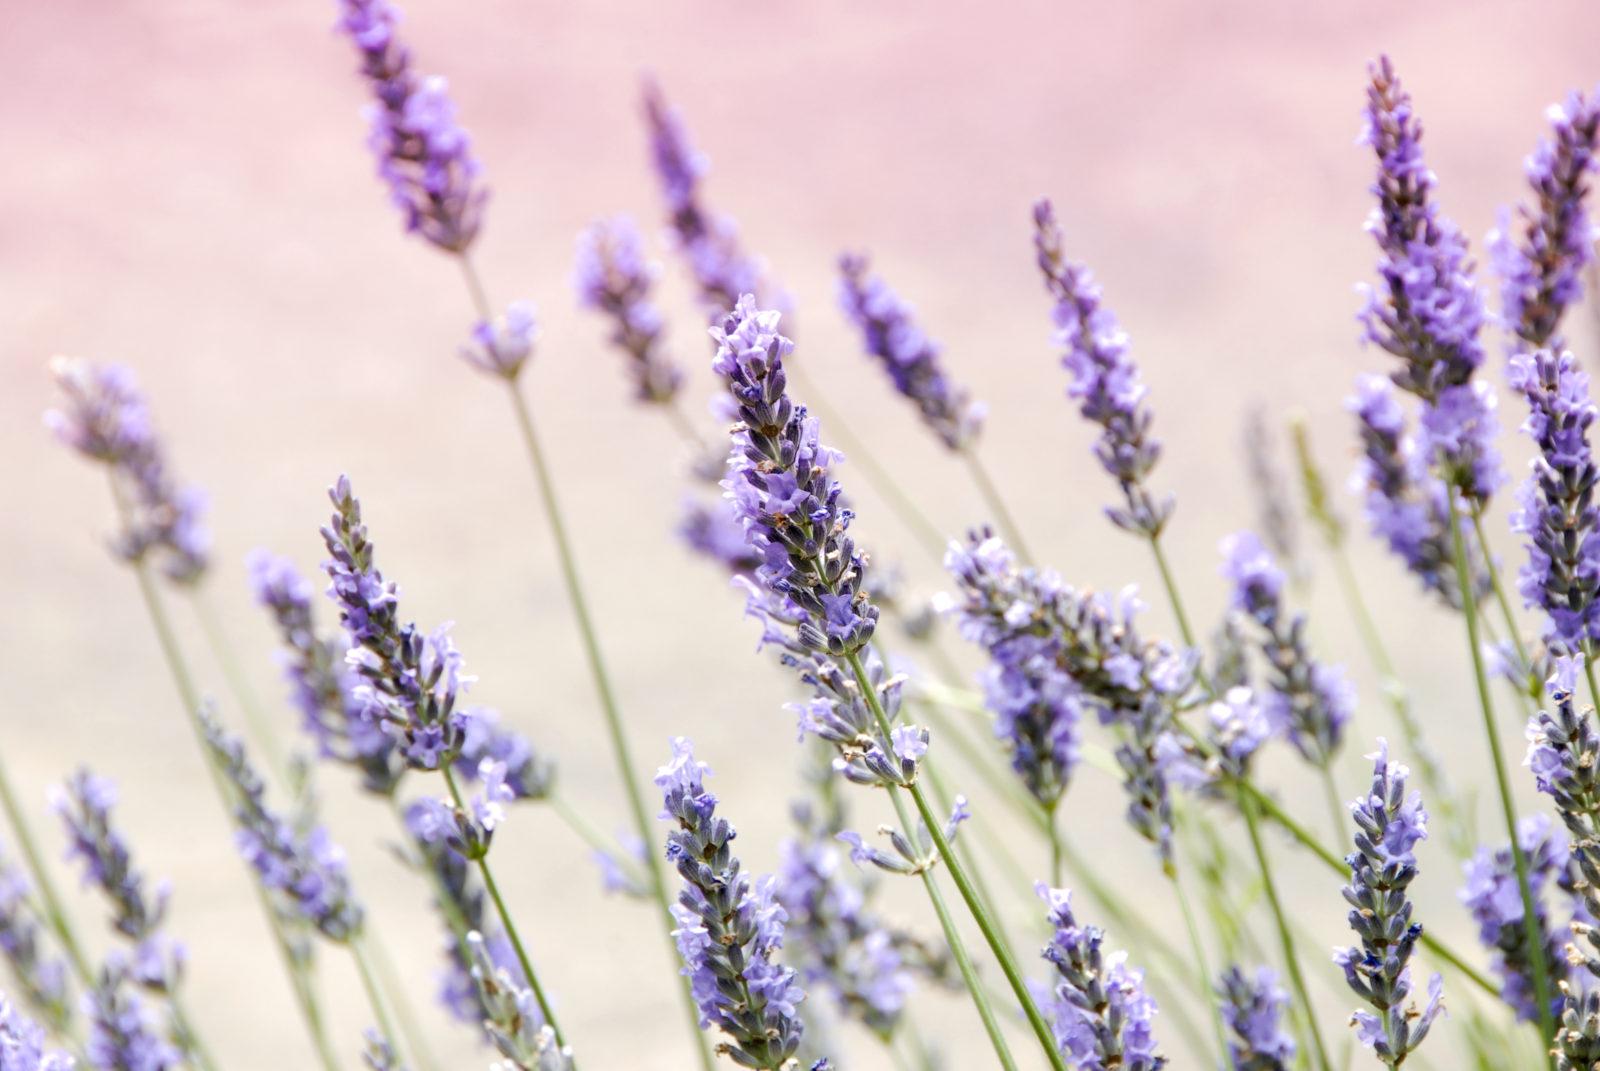 Lavender and Linalool